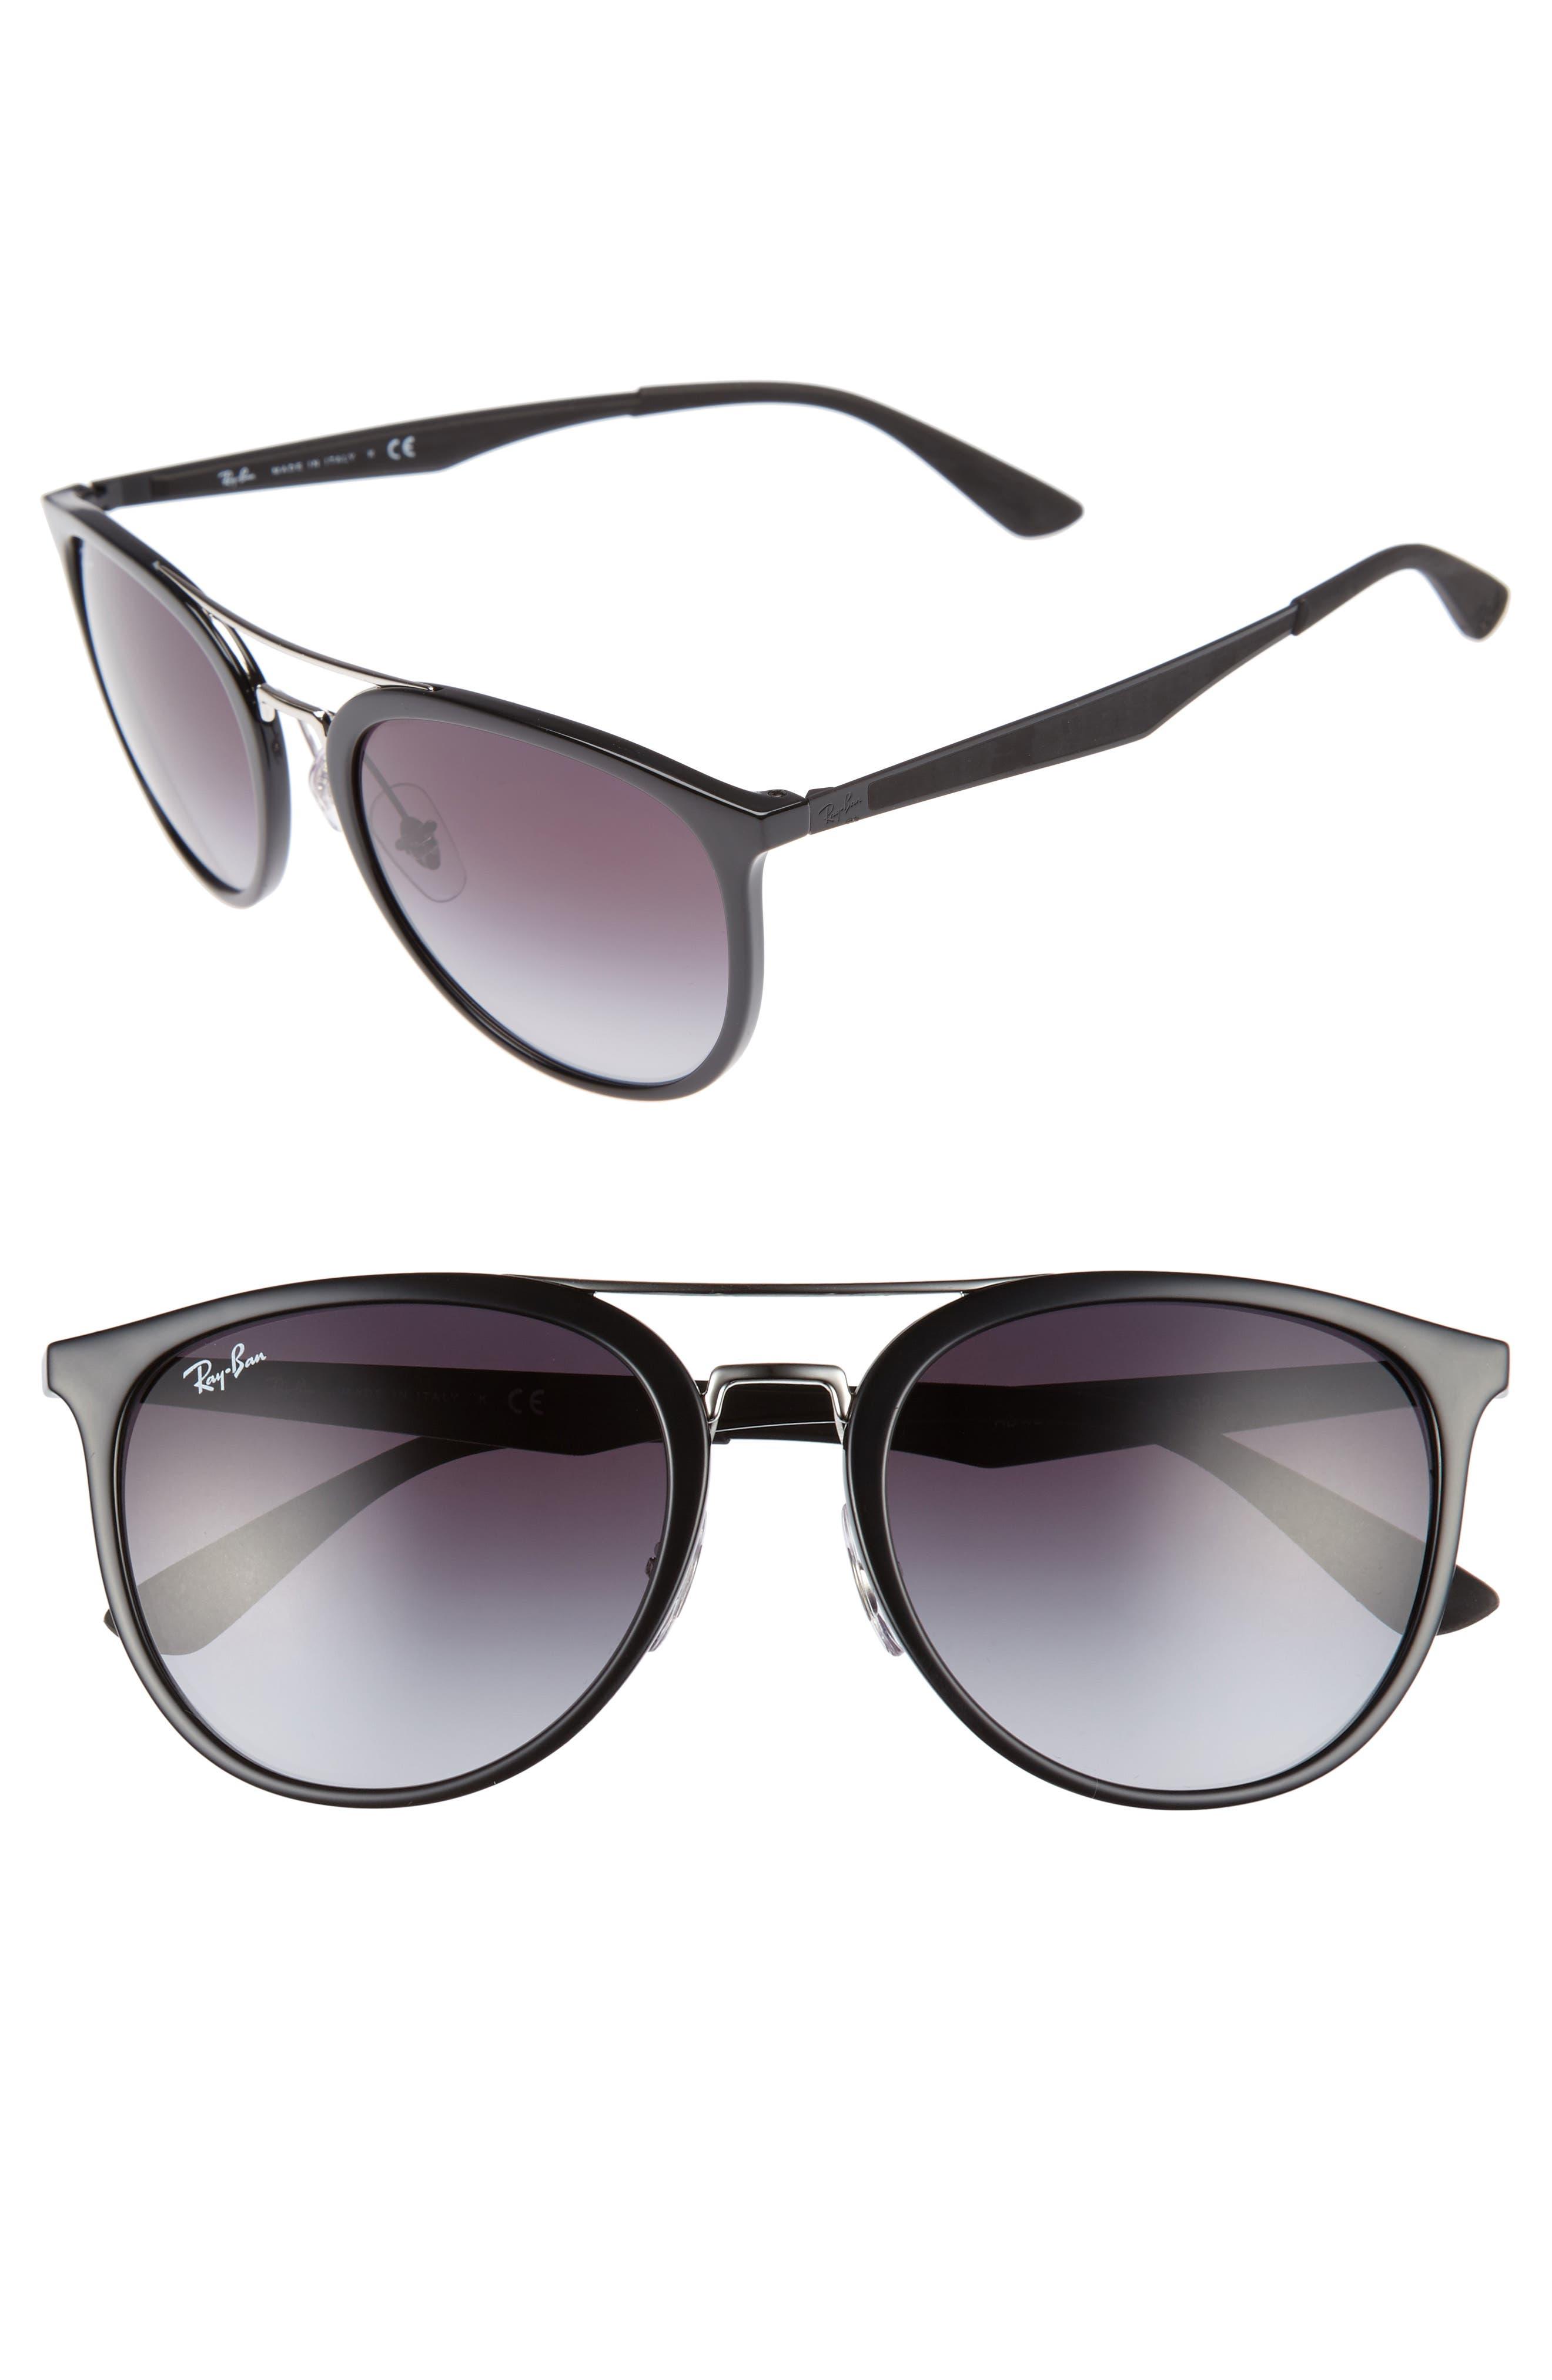 Main Image - Ray-Ban 55mm Gradient Lens Sunglasses